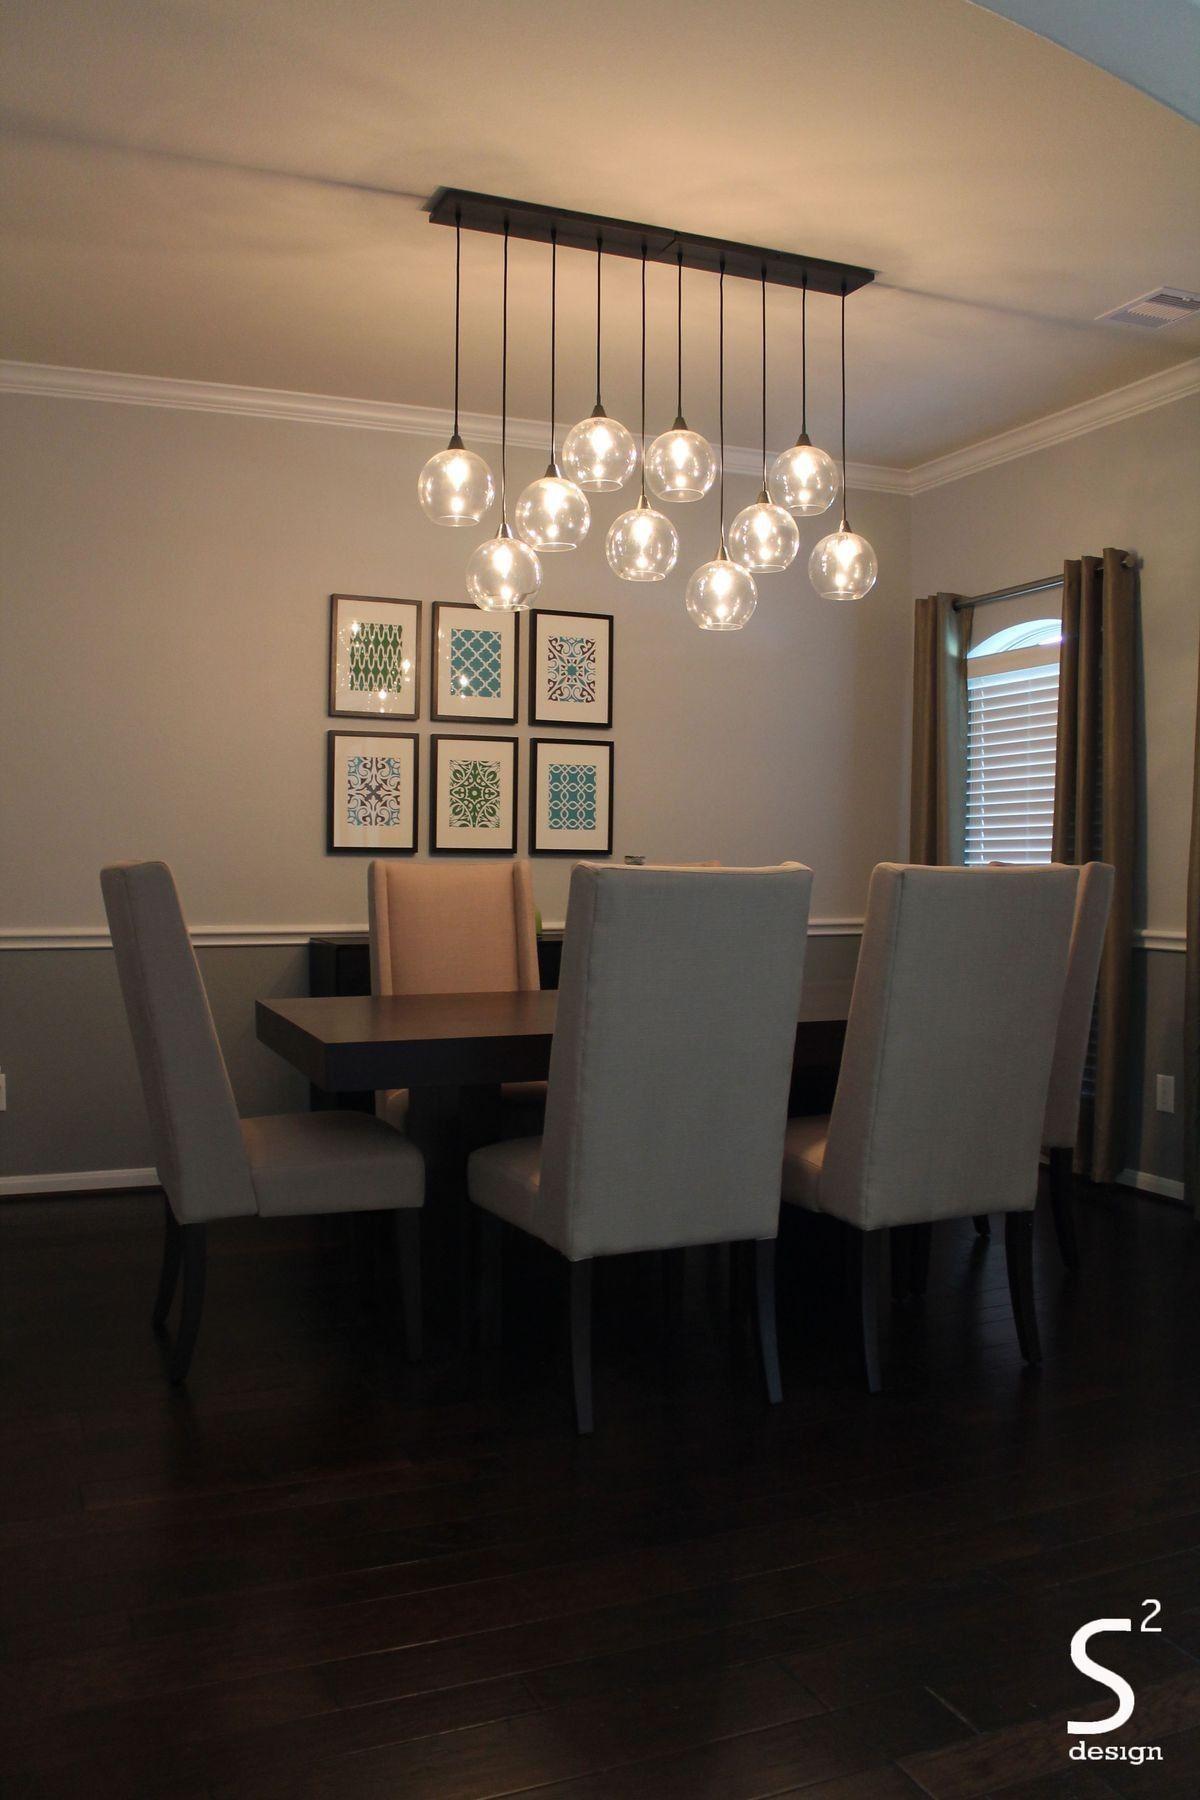 37 Fresh Room Ideas Led Lights Design Decorequired Dining Room Light Fixtures Pendant Lighting Dining Room Dining Room Lighting Ceiling lights for dining room